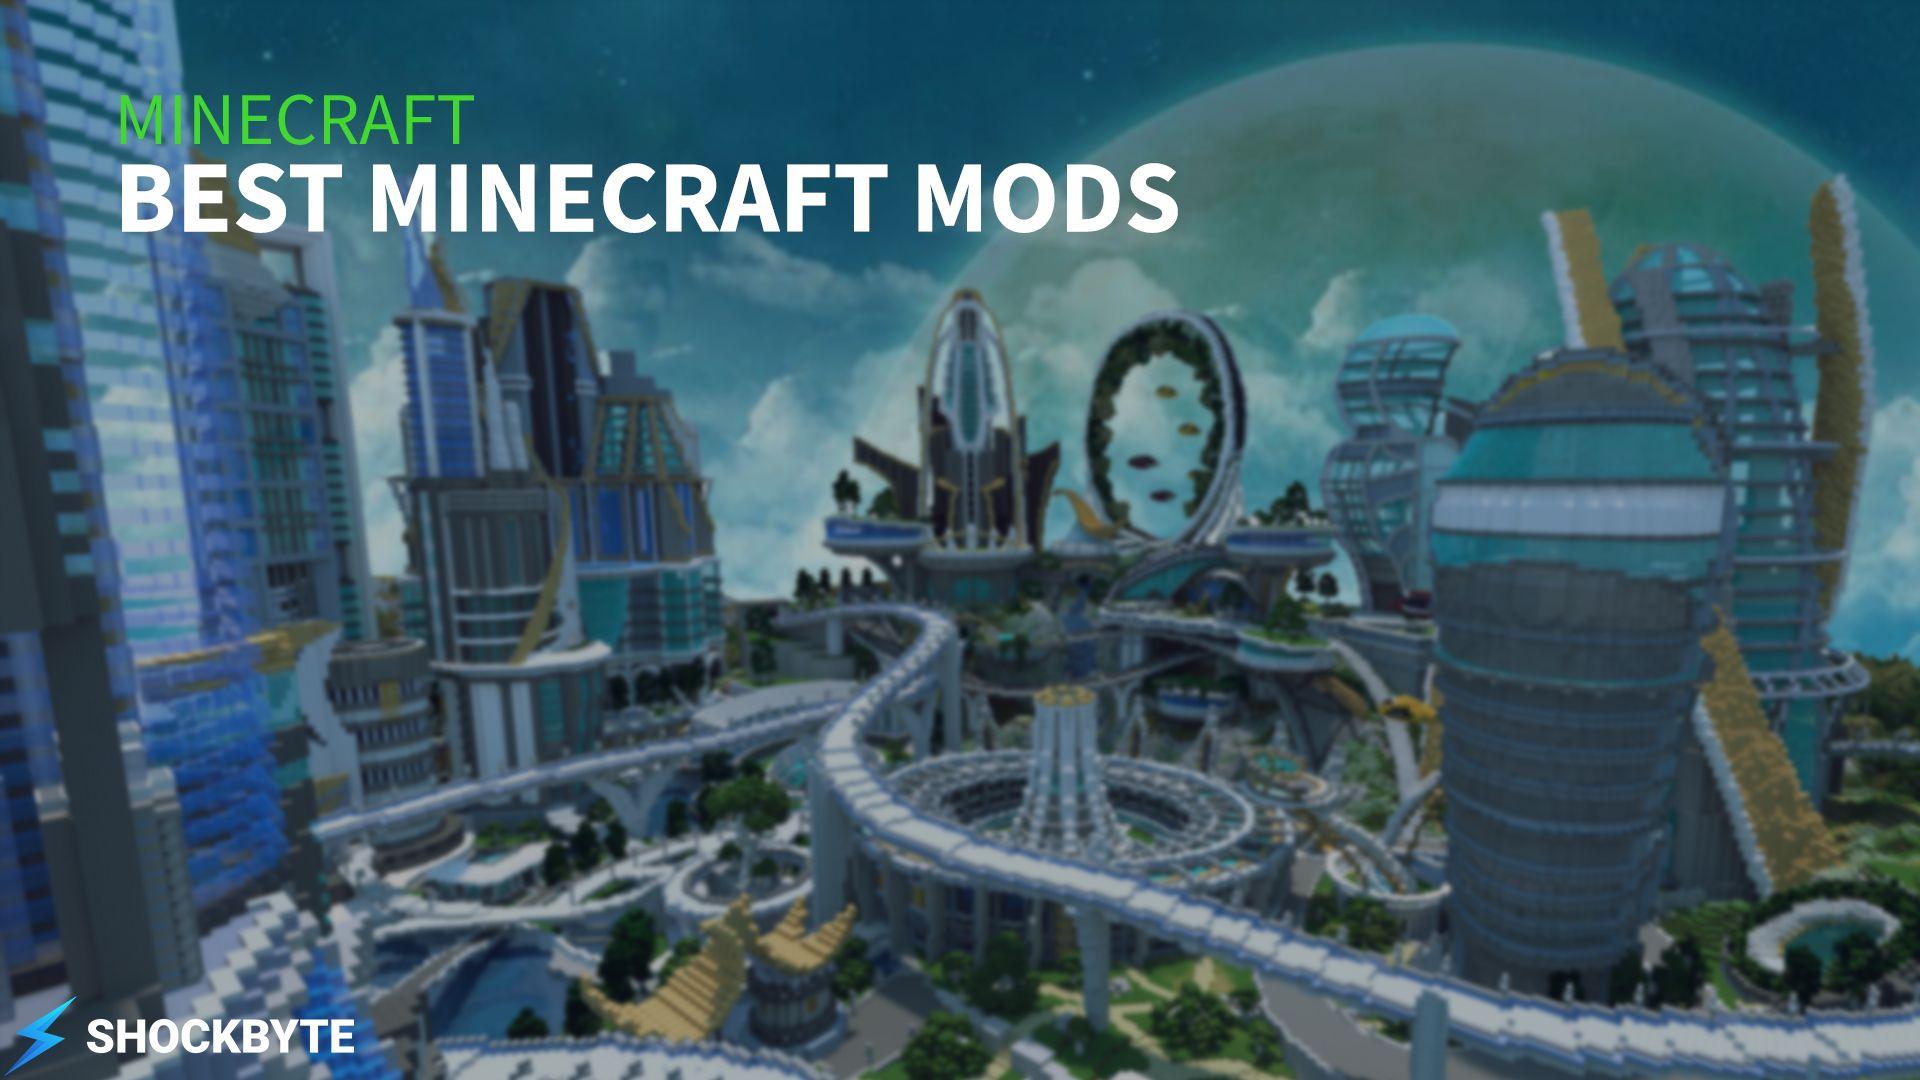 Minecraft 1 mods best dating ☝️ Jack Game